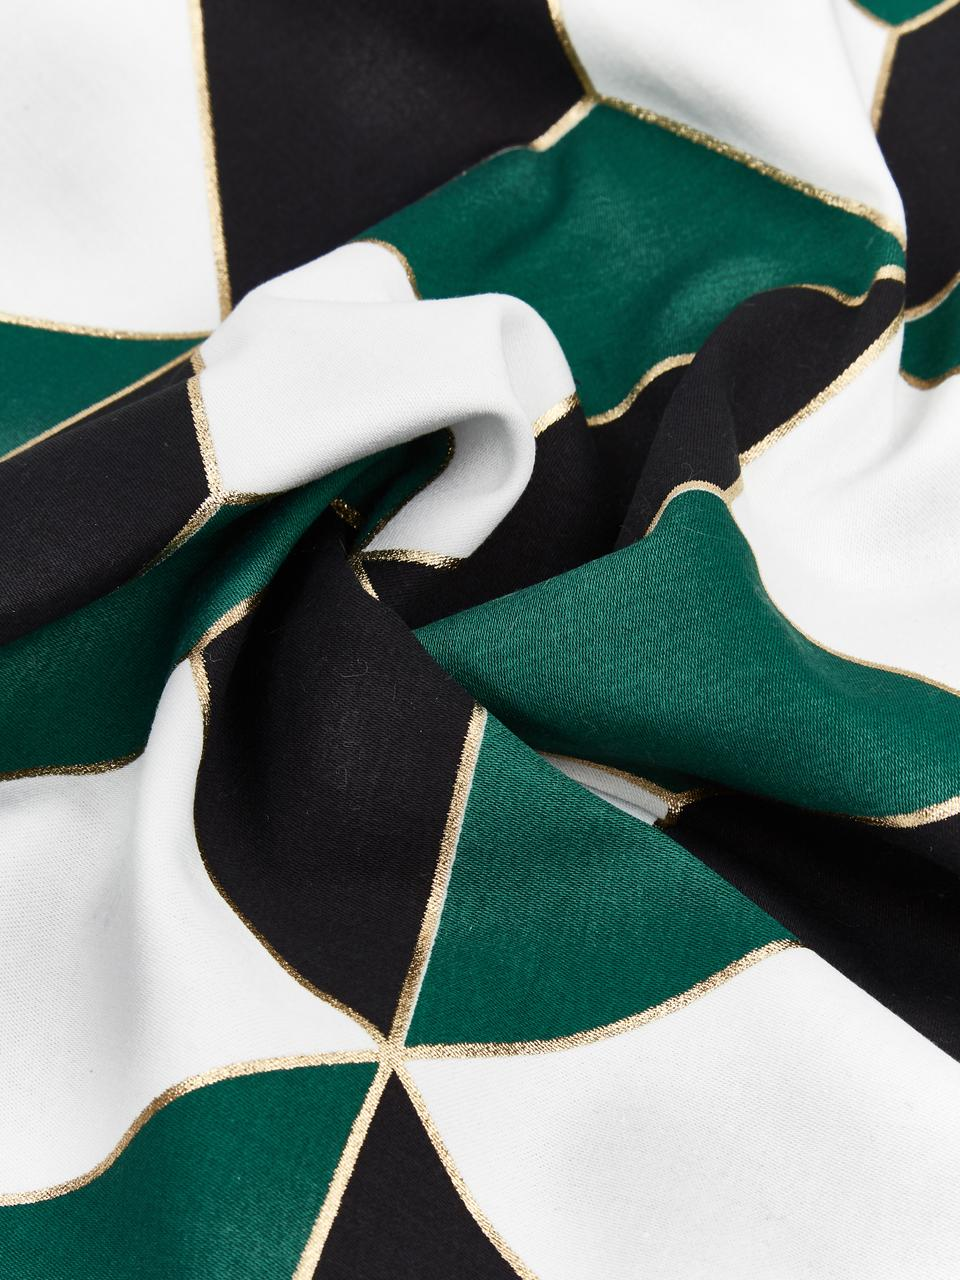 Funda de cojín estampada Geo, 100%algodón, Blanco crema, verde, dorado, An 45 x L 45 cm